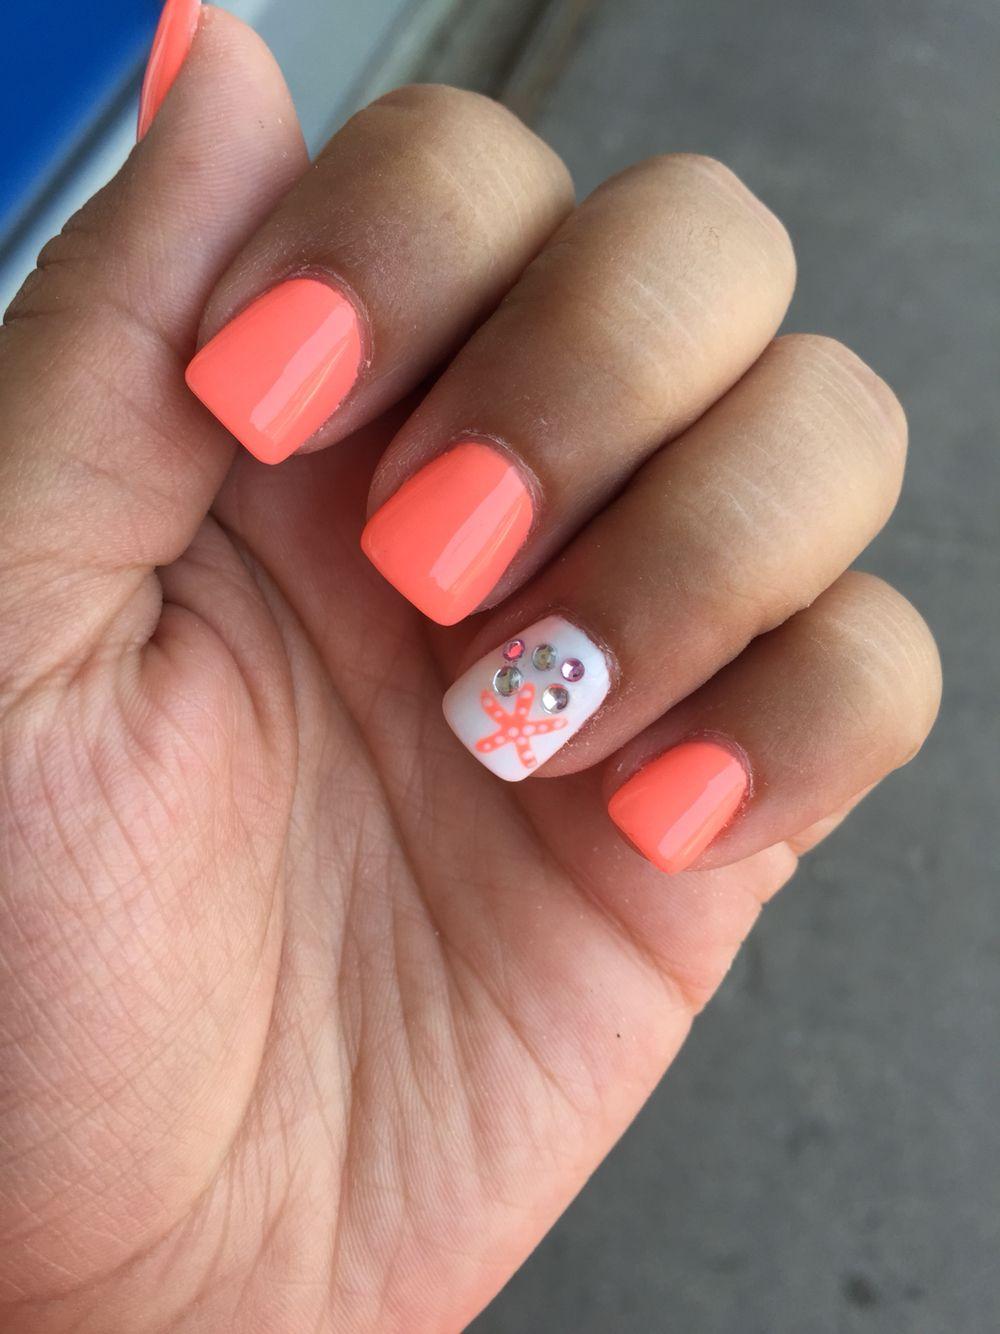 Lilshawtybad Summer Nail Art Design Nails Pinterest Diseños